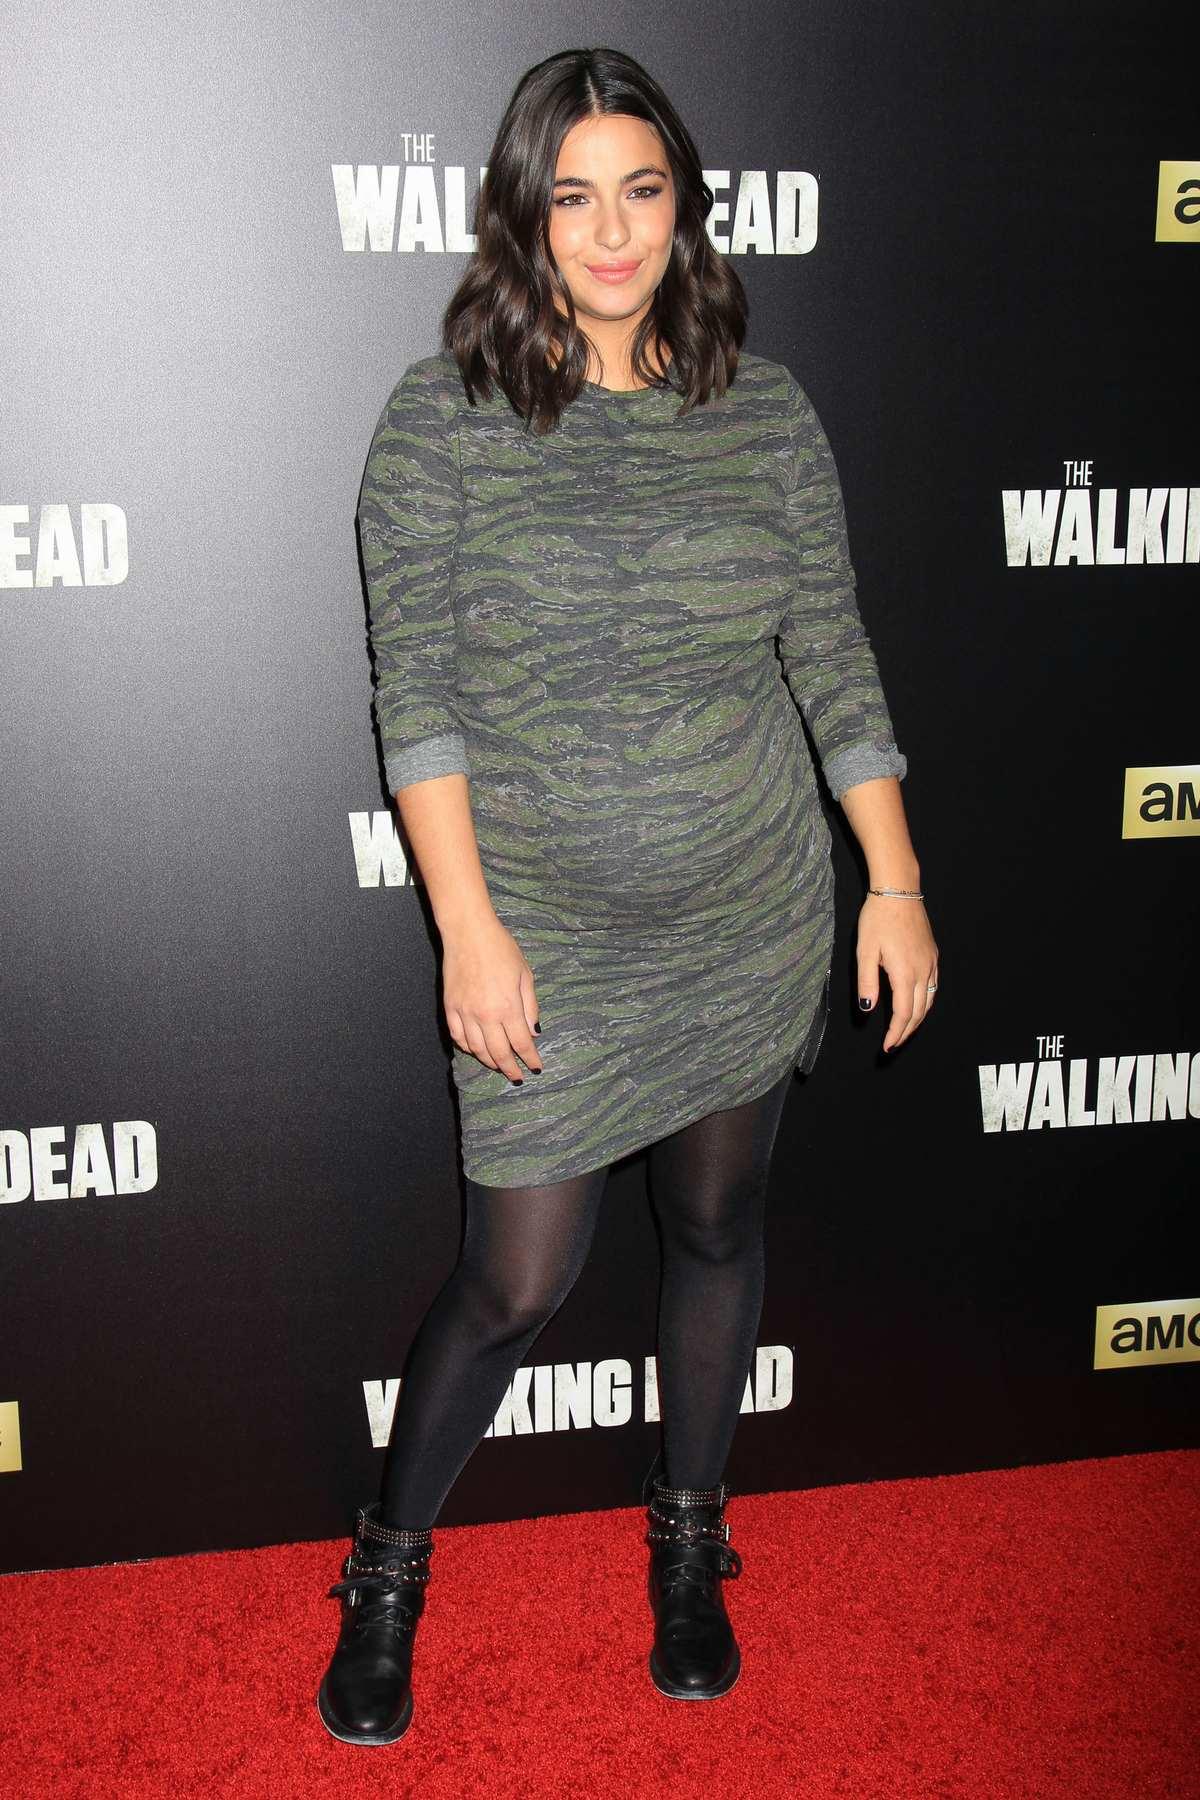 Alanna Masterson Actor | TV Guide